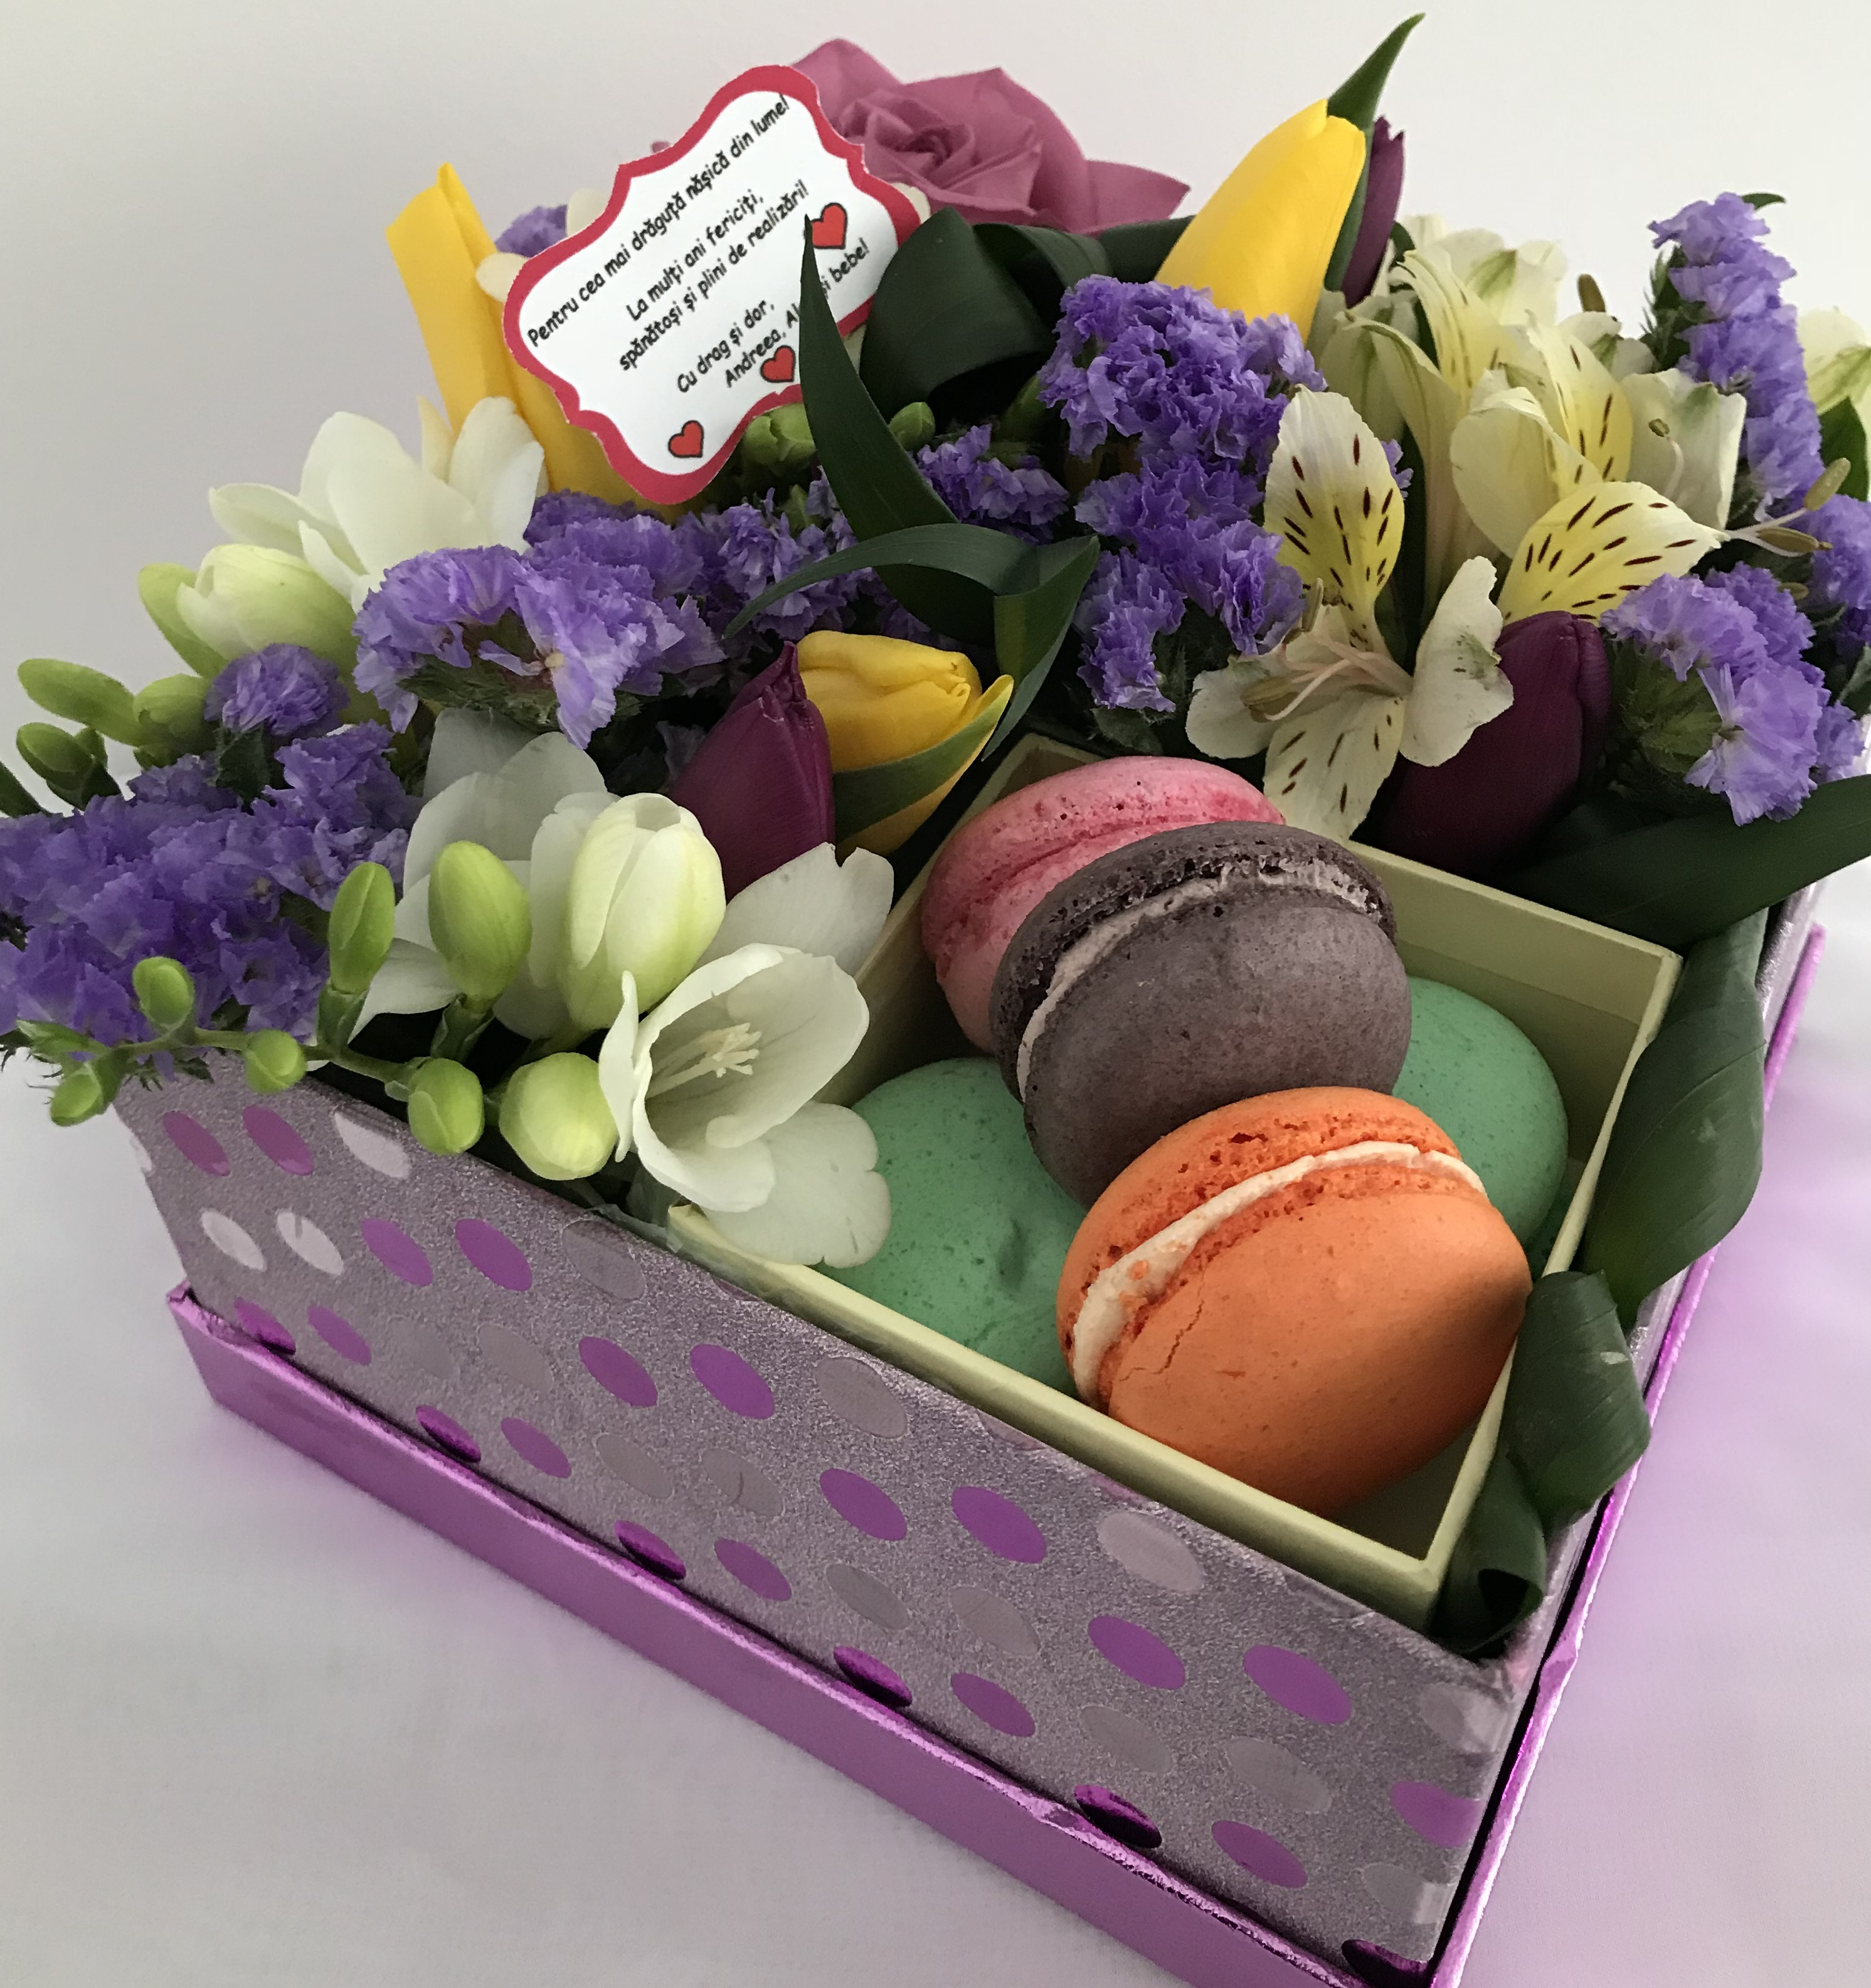 Cosuri cu flori, cadouri, buchete